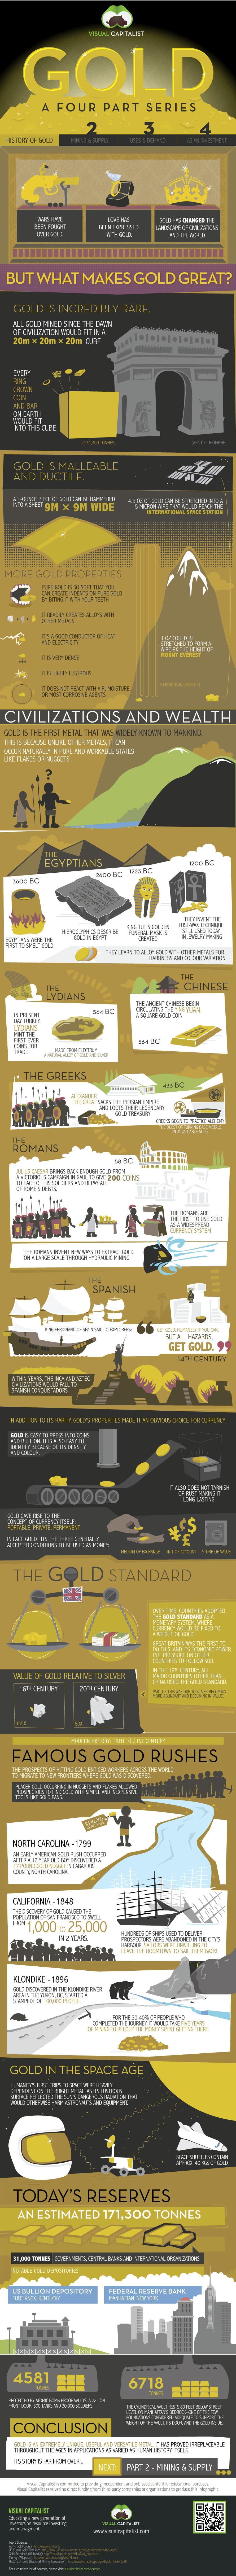 gold-history (1)